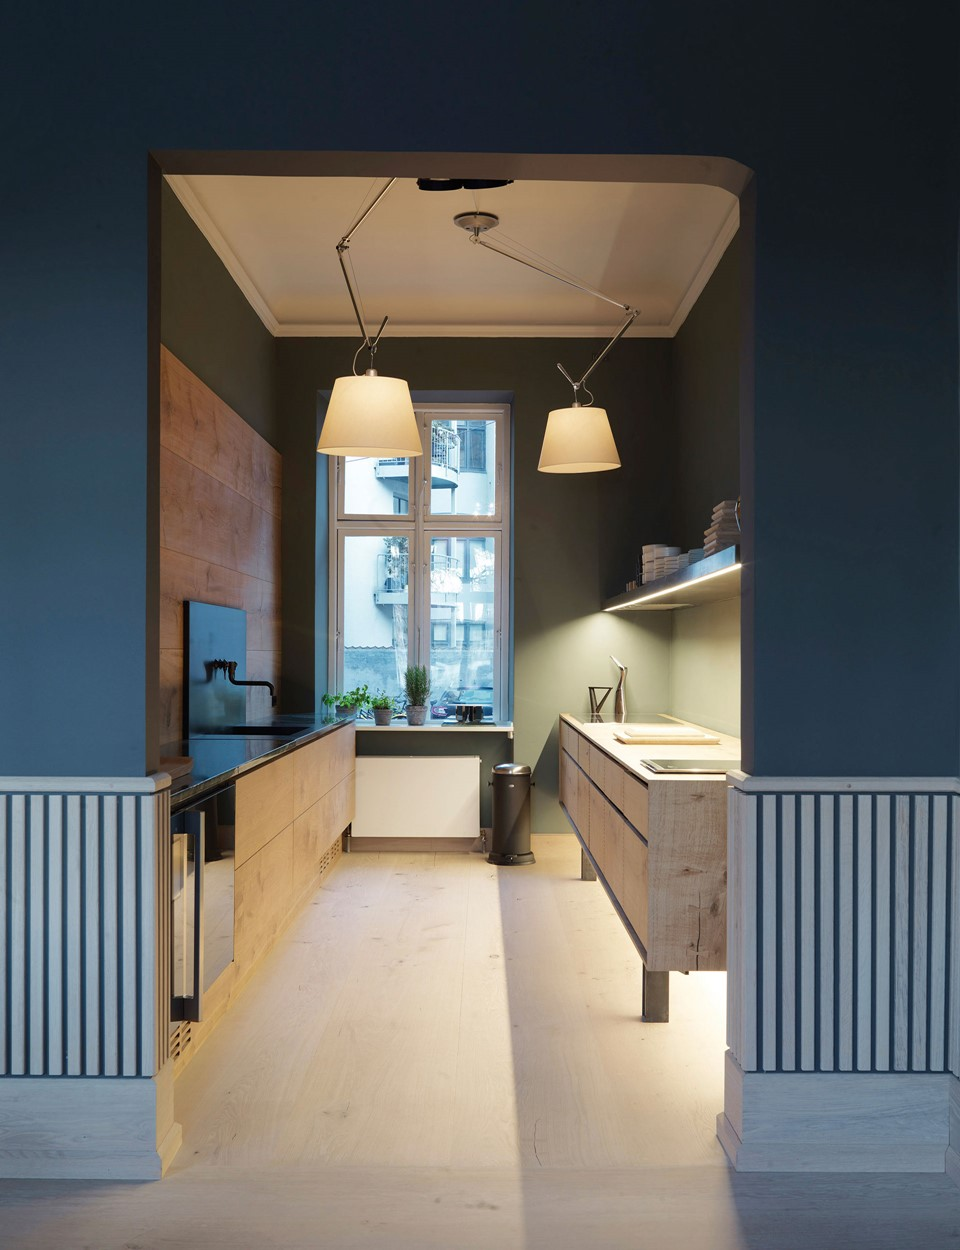 dinesen-showroom-copenhagen_oak-kitchen_dinesen.jpg